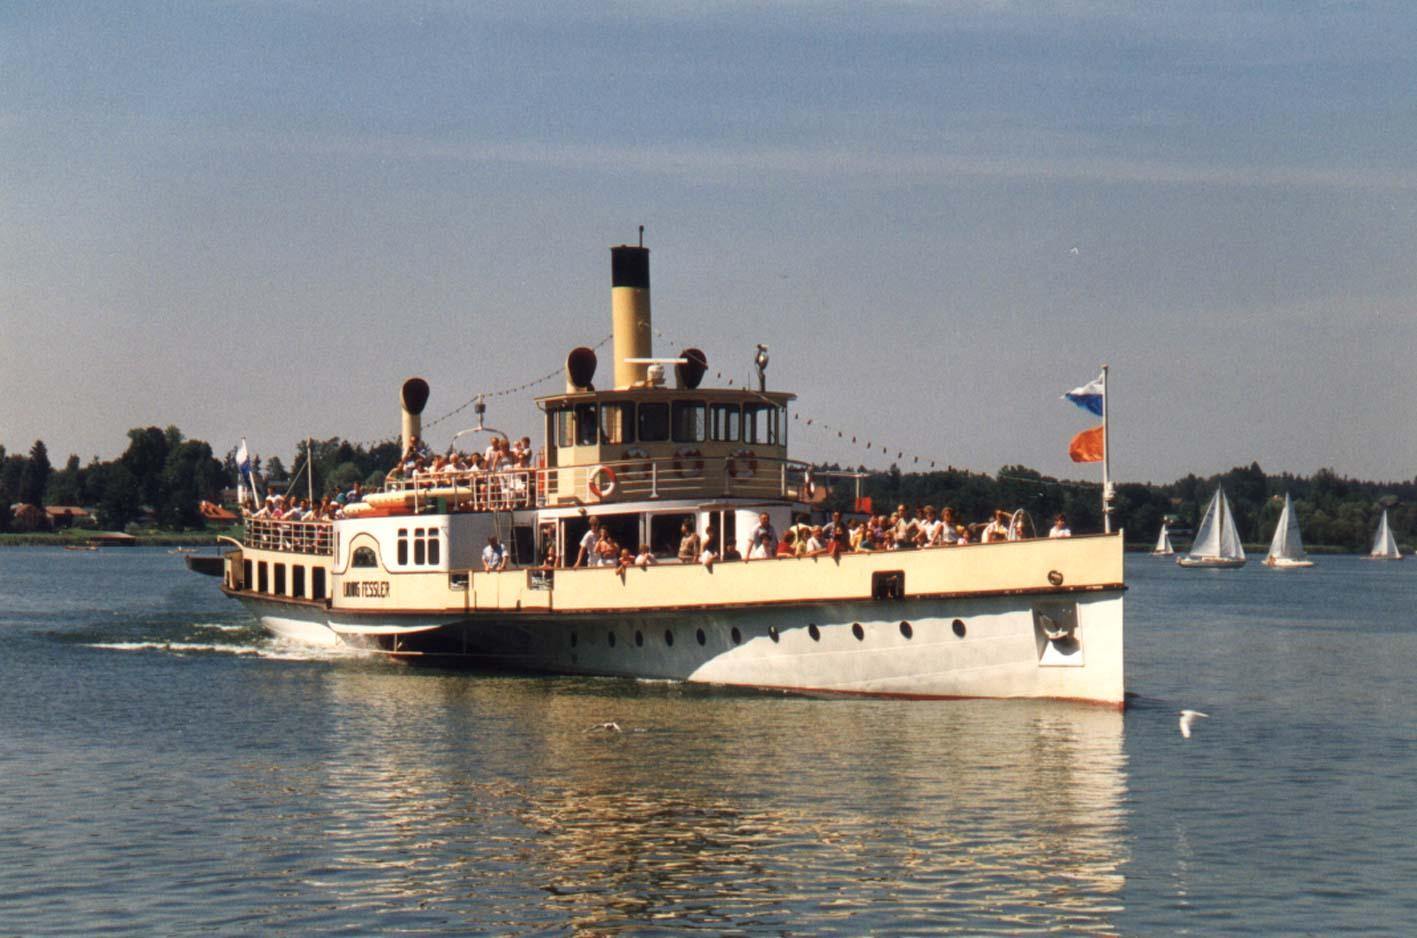 Dampfschiff Ludwig Fessler